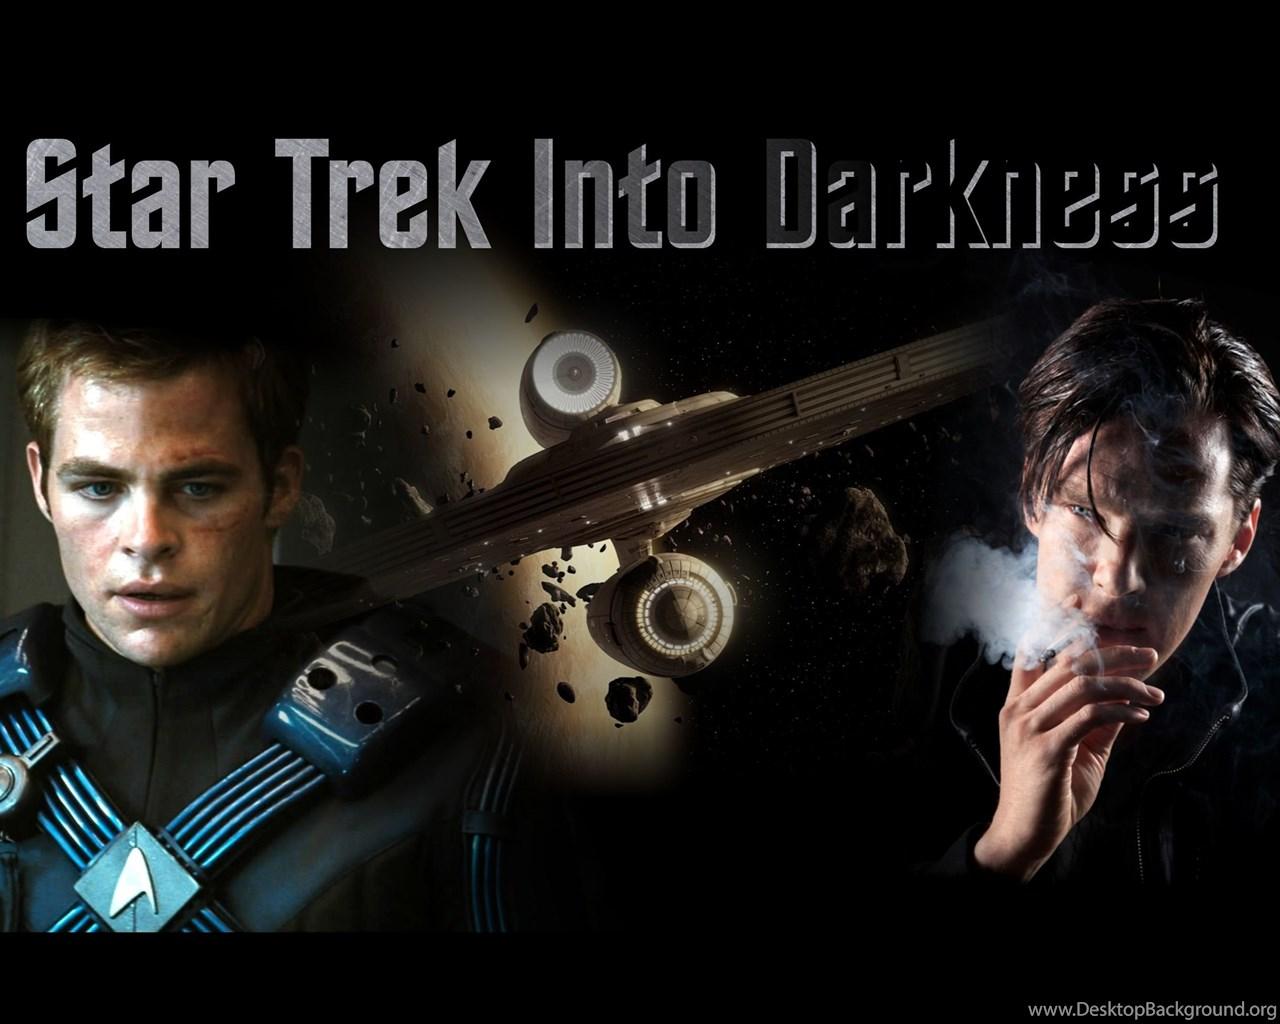 Free Star Trek Into Darkness 2013 Wallpapers Hd Desktop Background